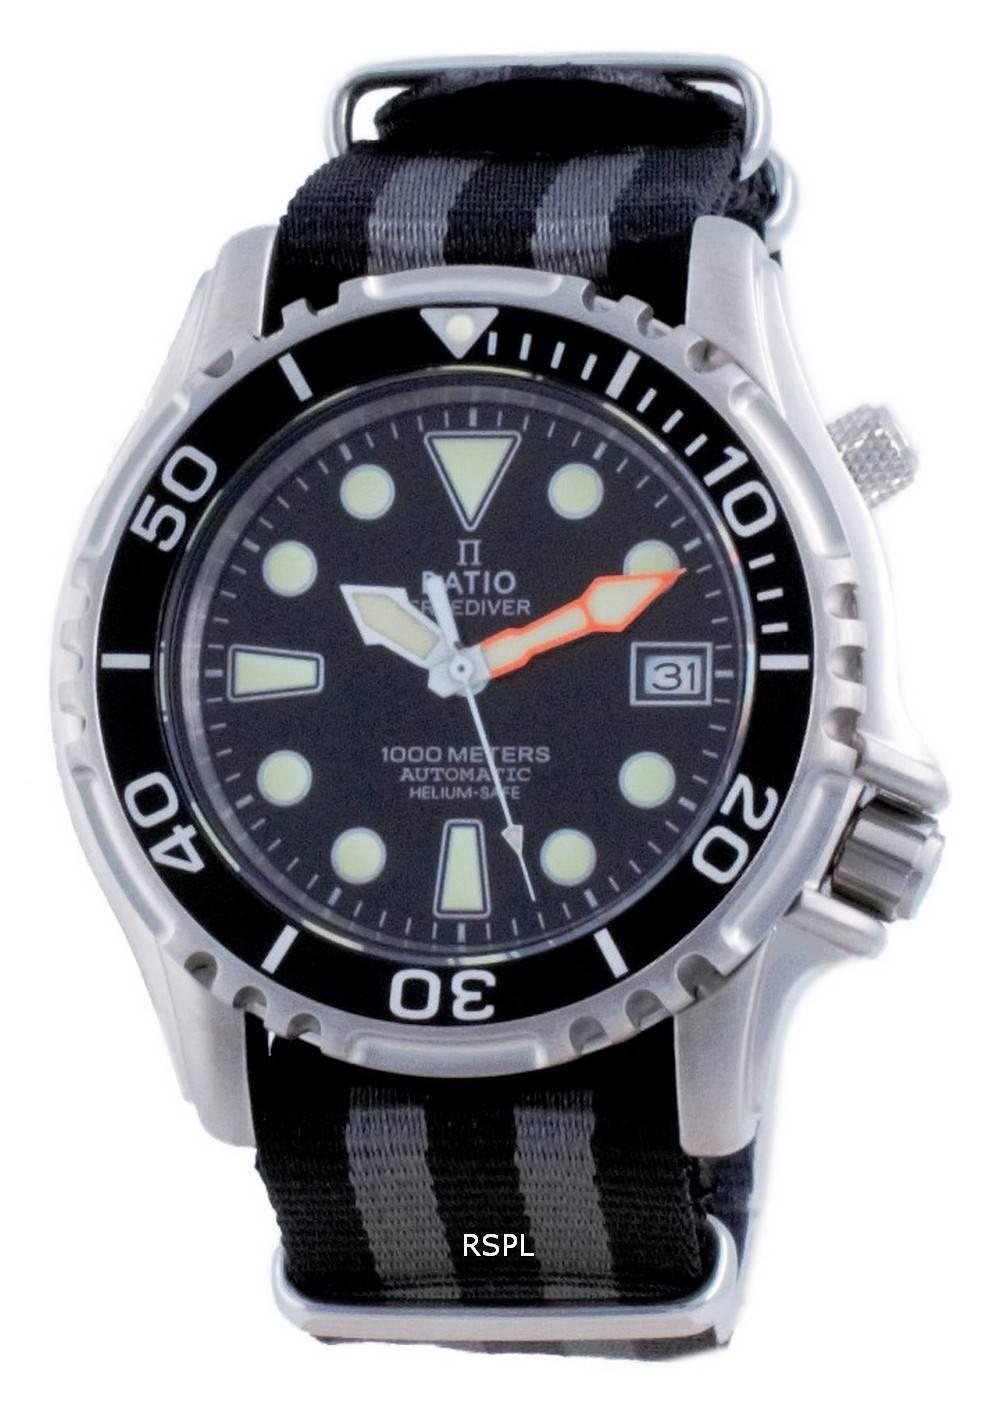 Suhde vapaa Diver Helium Safe Nylon Automatic Diver&#39,s 1066KE20-33VA-BLK-var-NATO1 1000M miesten kello